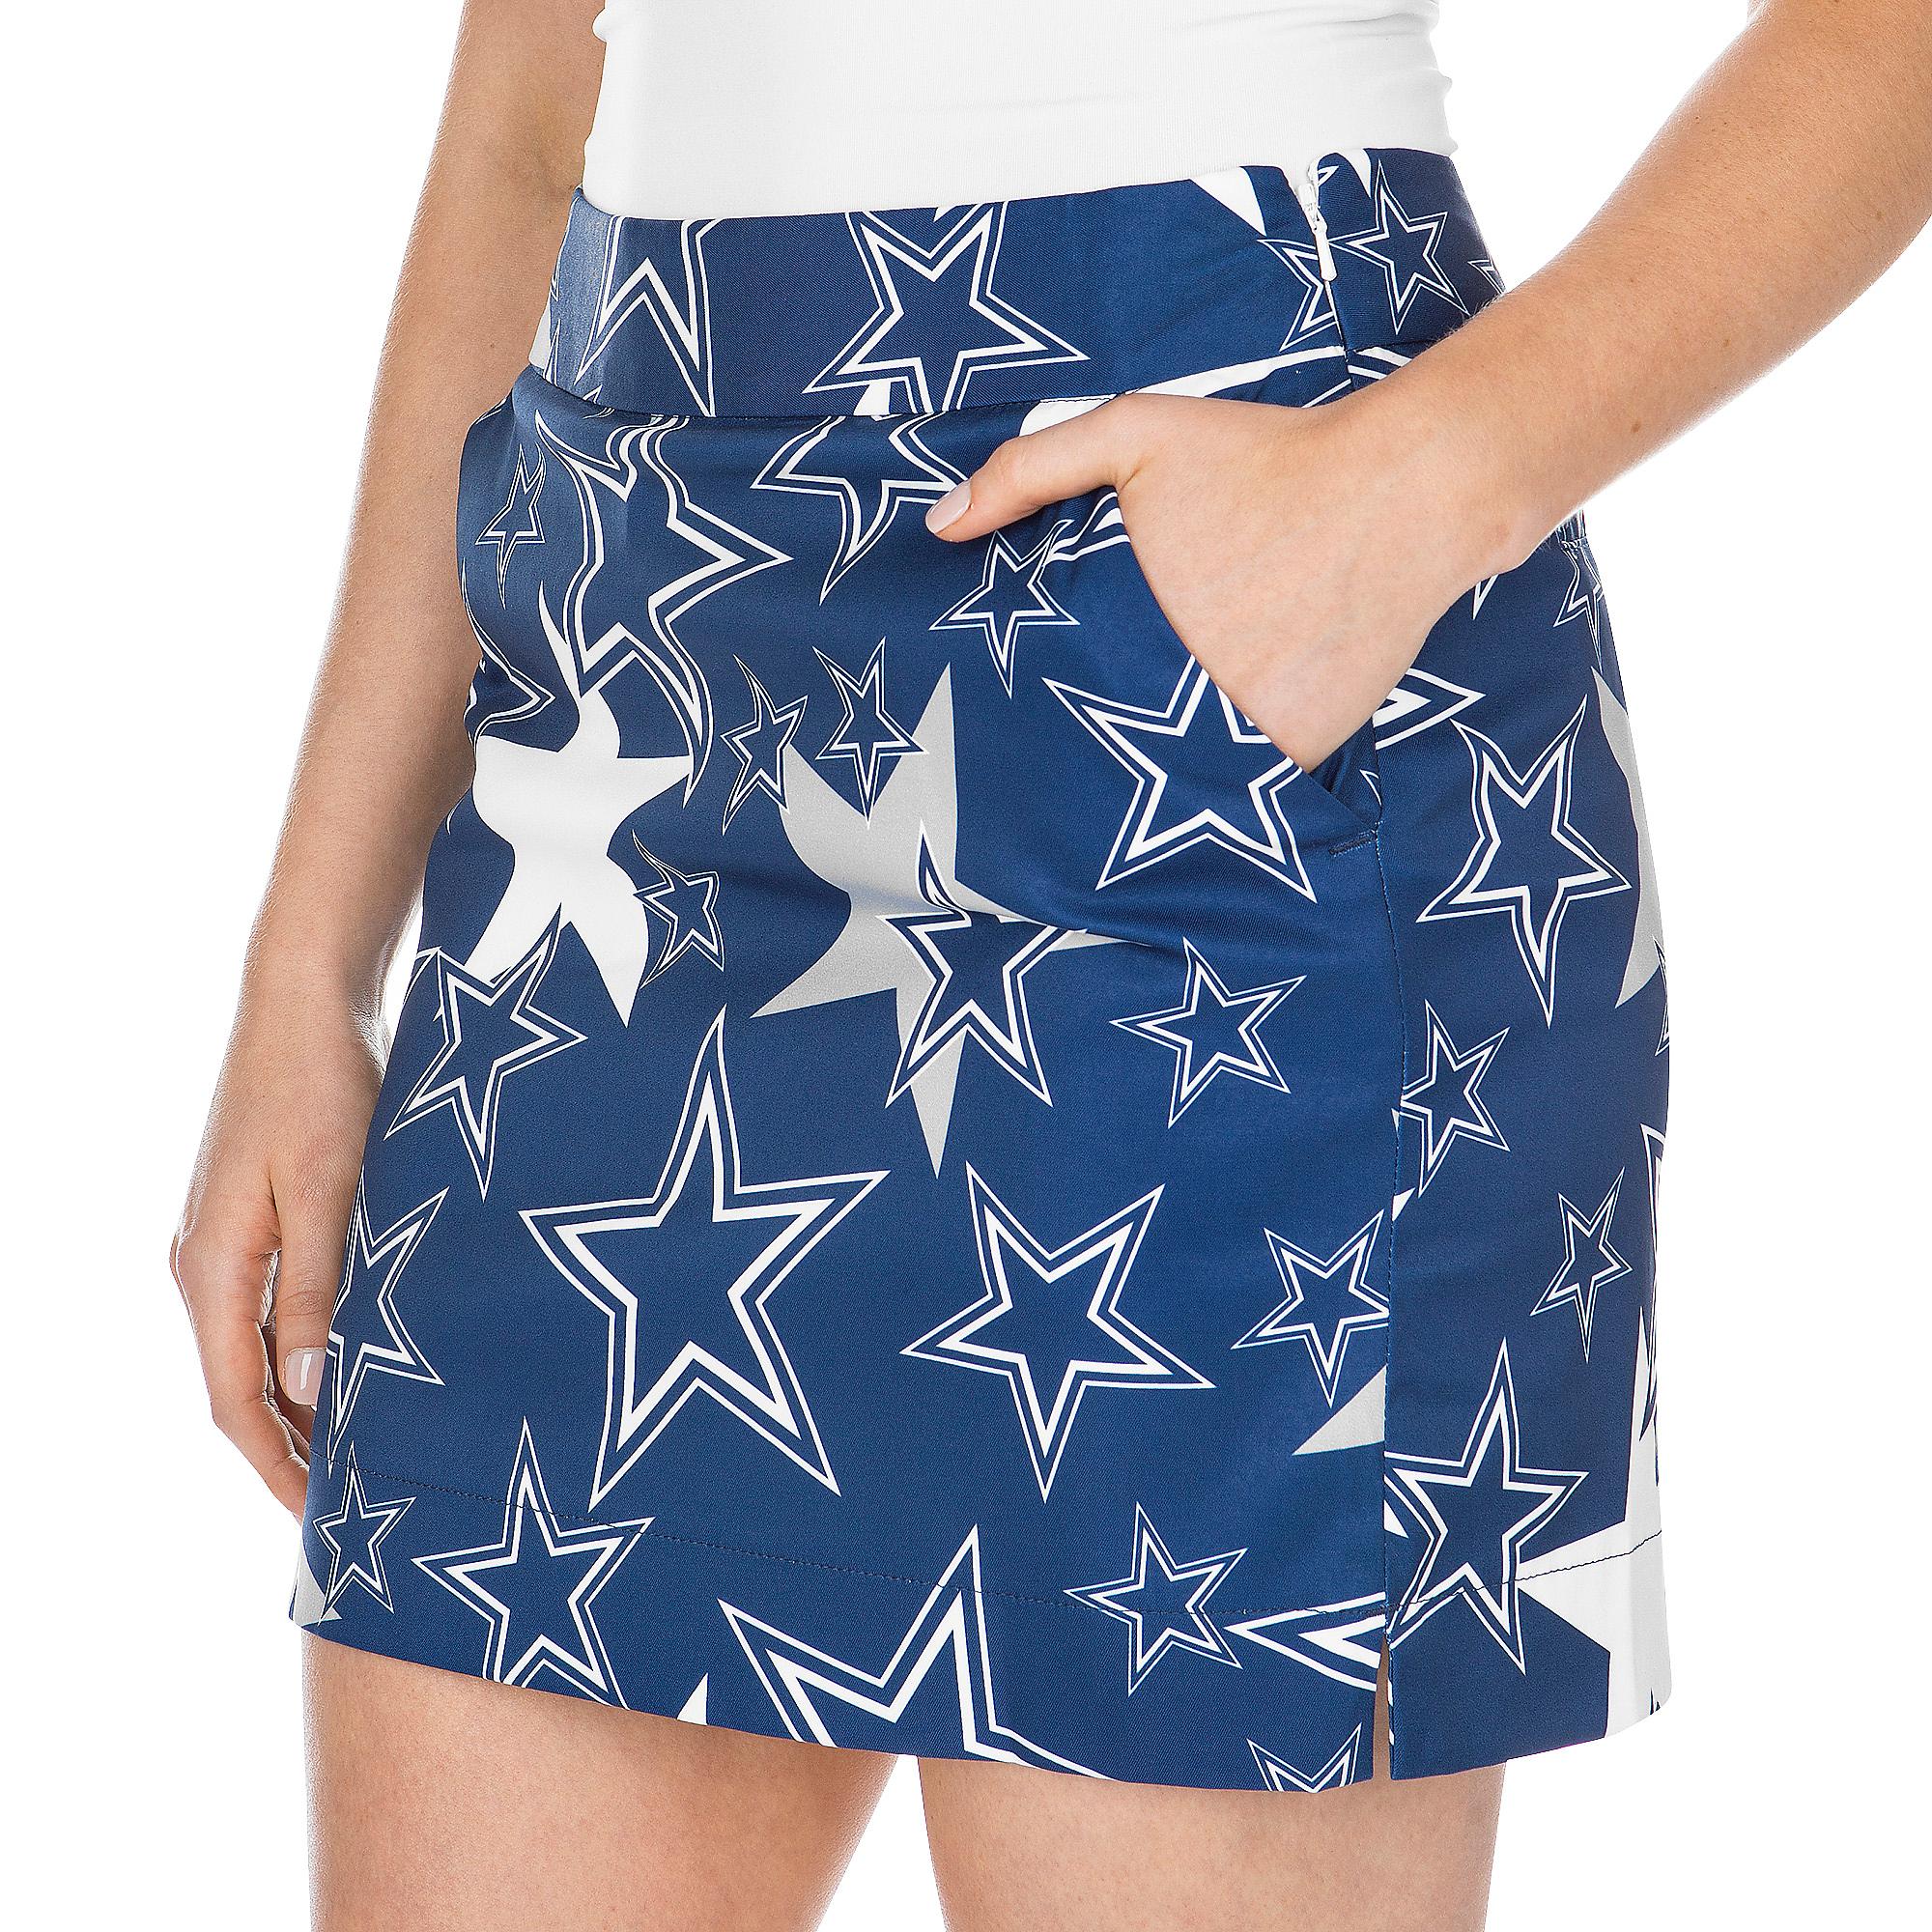 Dallas Cowboys Loudmouth Womens Star Stretch Tech Skirt  7ff14eb77